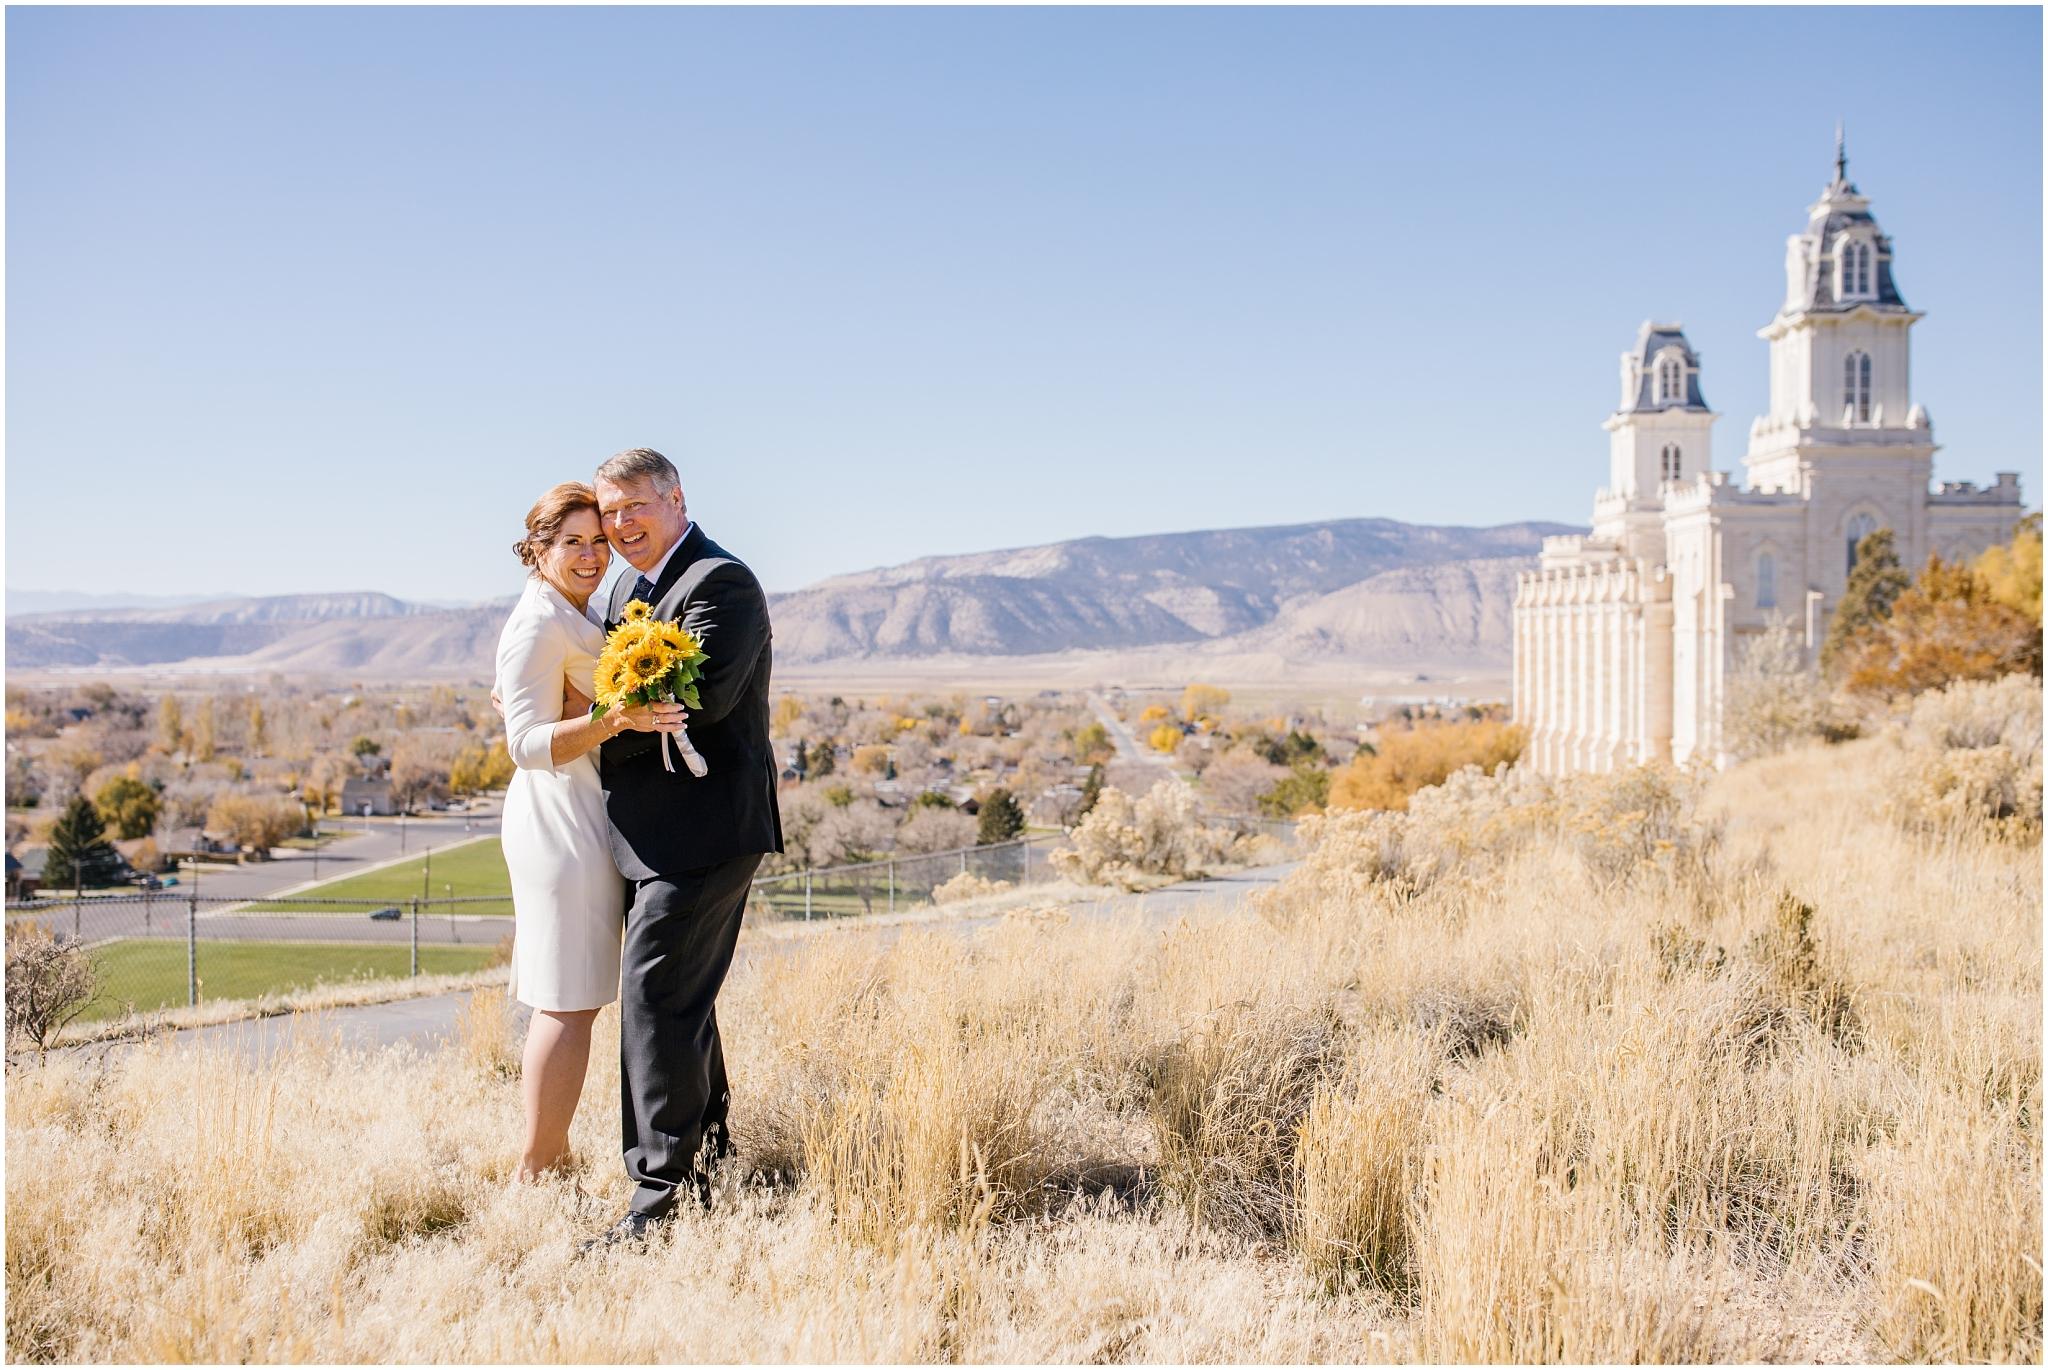 PDWeddingDay-86_Lizzie-B-Imagery-Utah-Wedding-Photographer-Salt-Lake-City-Park-City-Utah-County-Manti-Temple.jpg